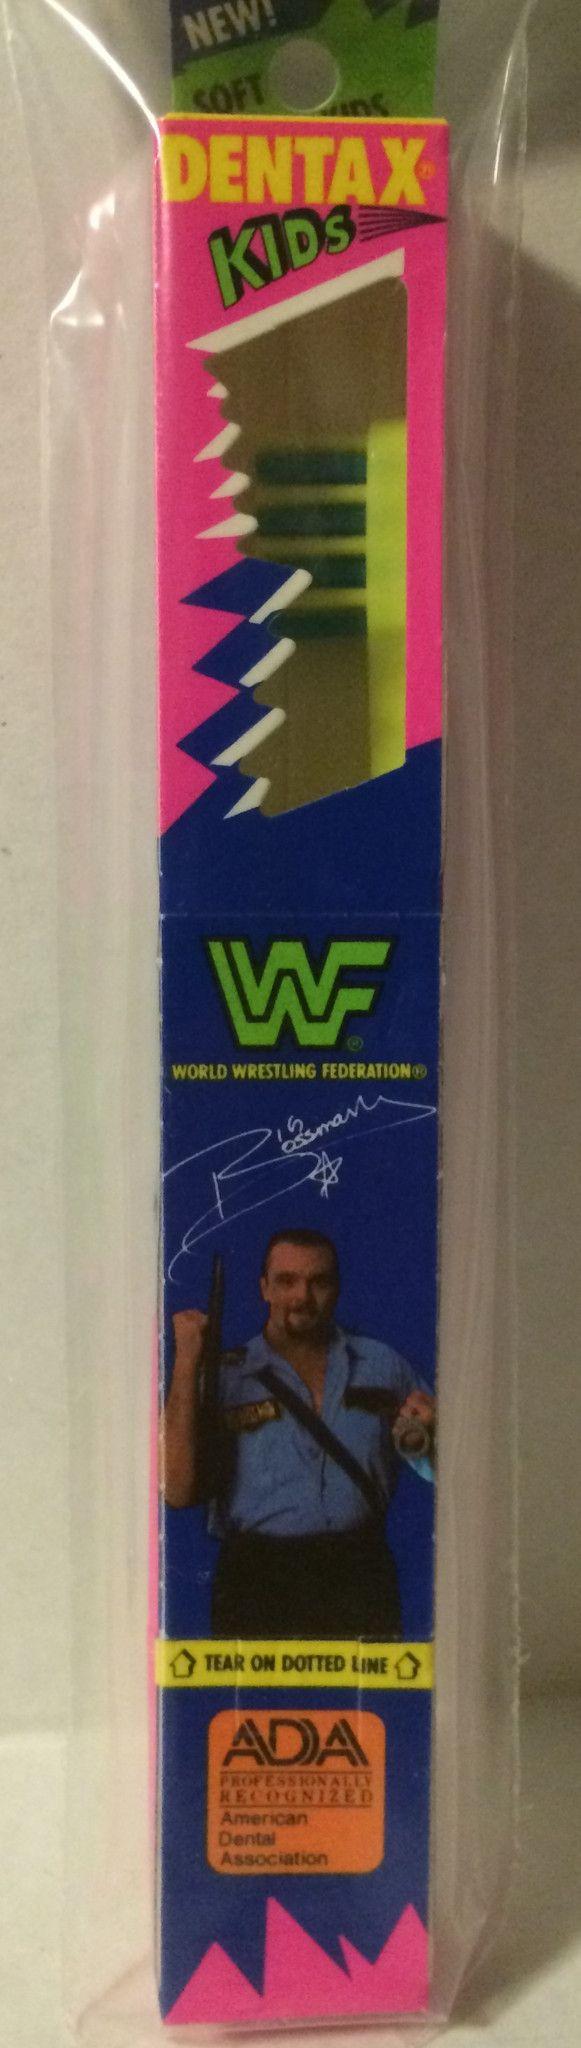 (GBS04715) - WWF WWE WCW nWo Wrestling Dentax Kids Toothbrush - Big Boss Man